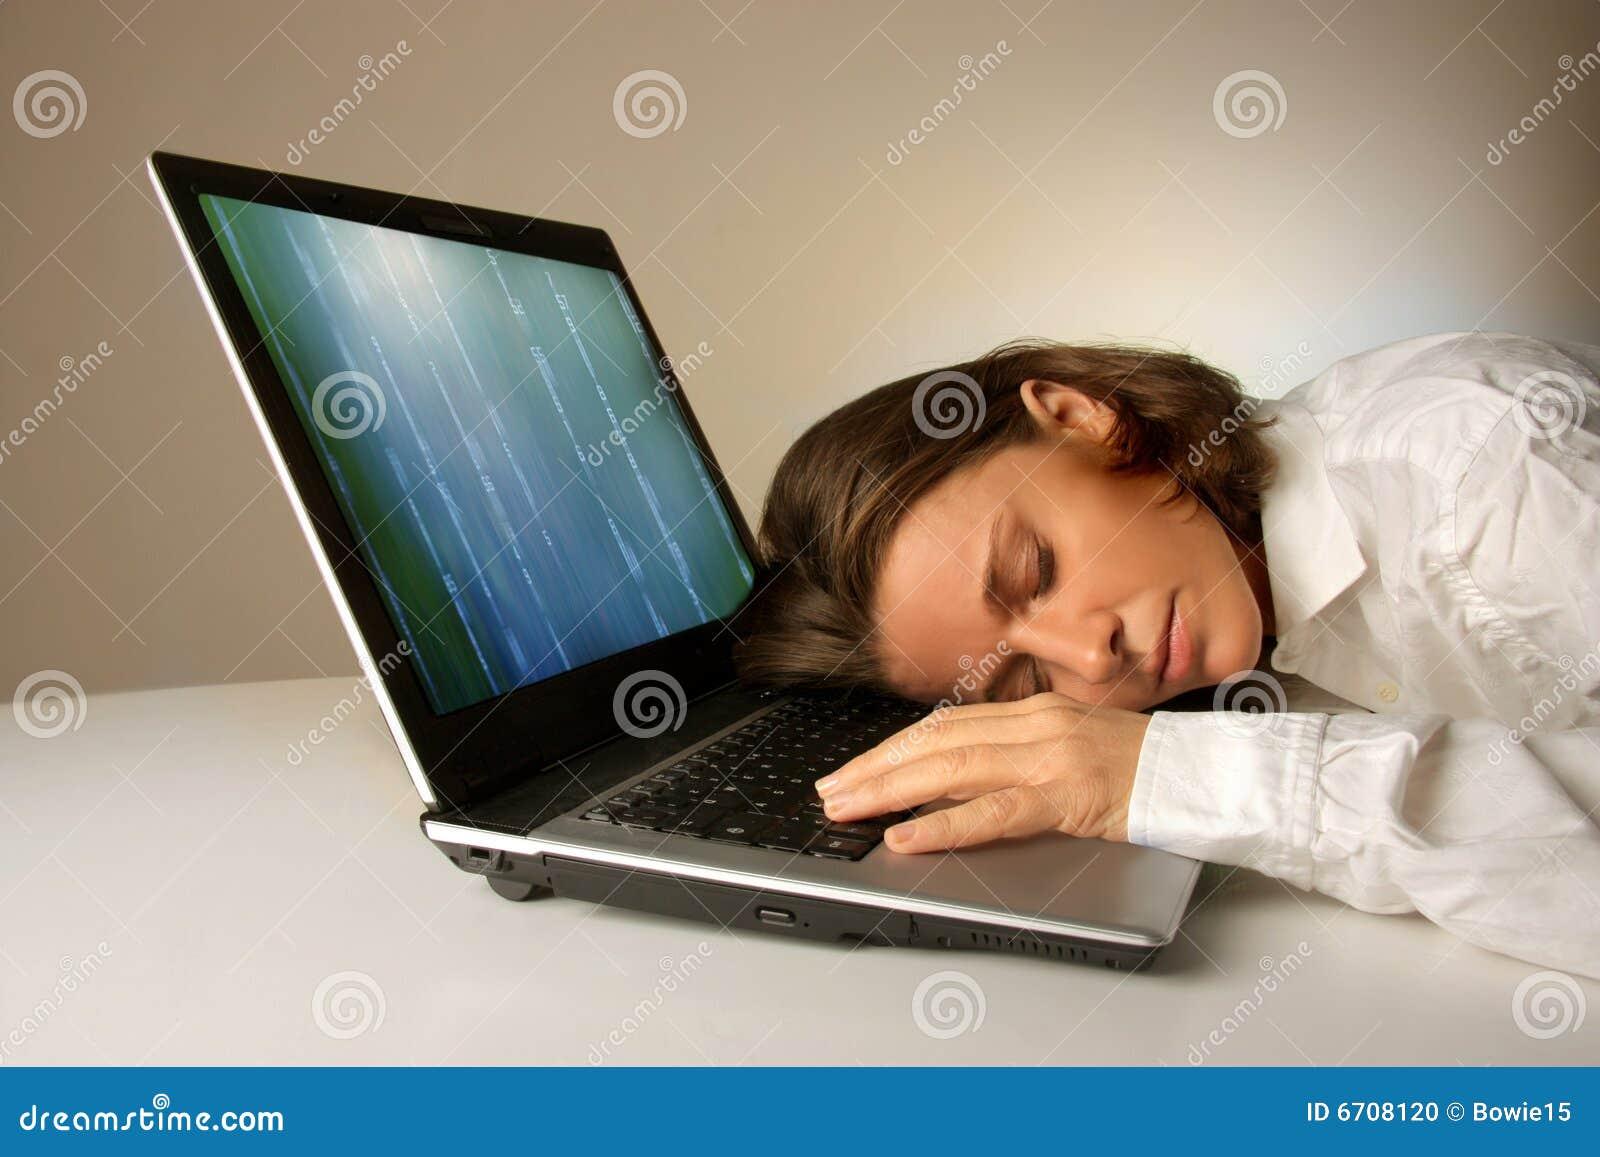 Sleep on a laptop